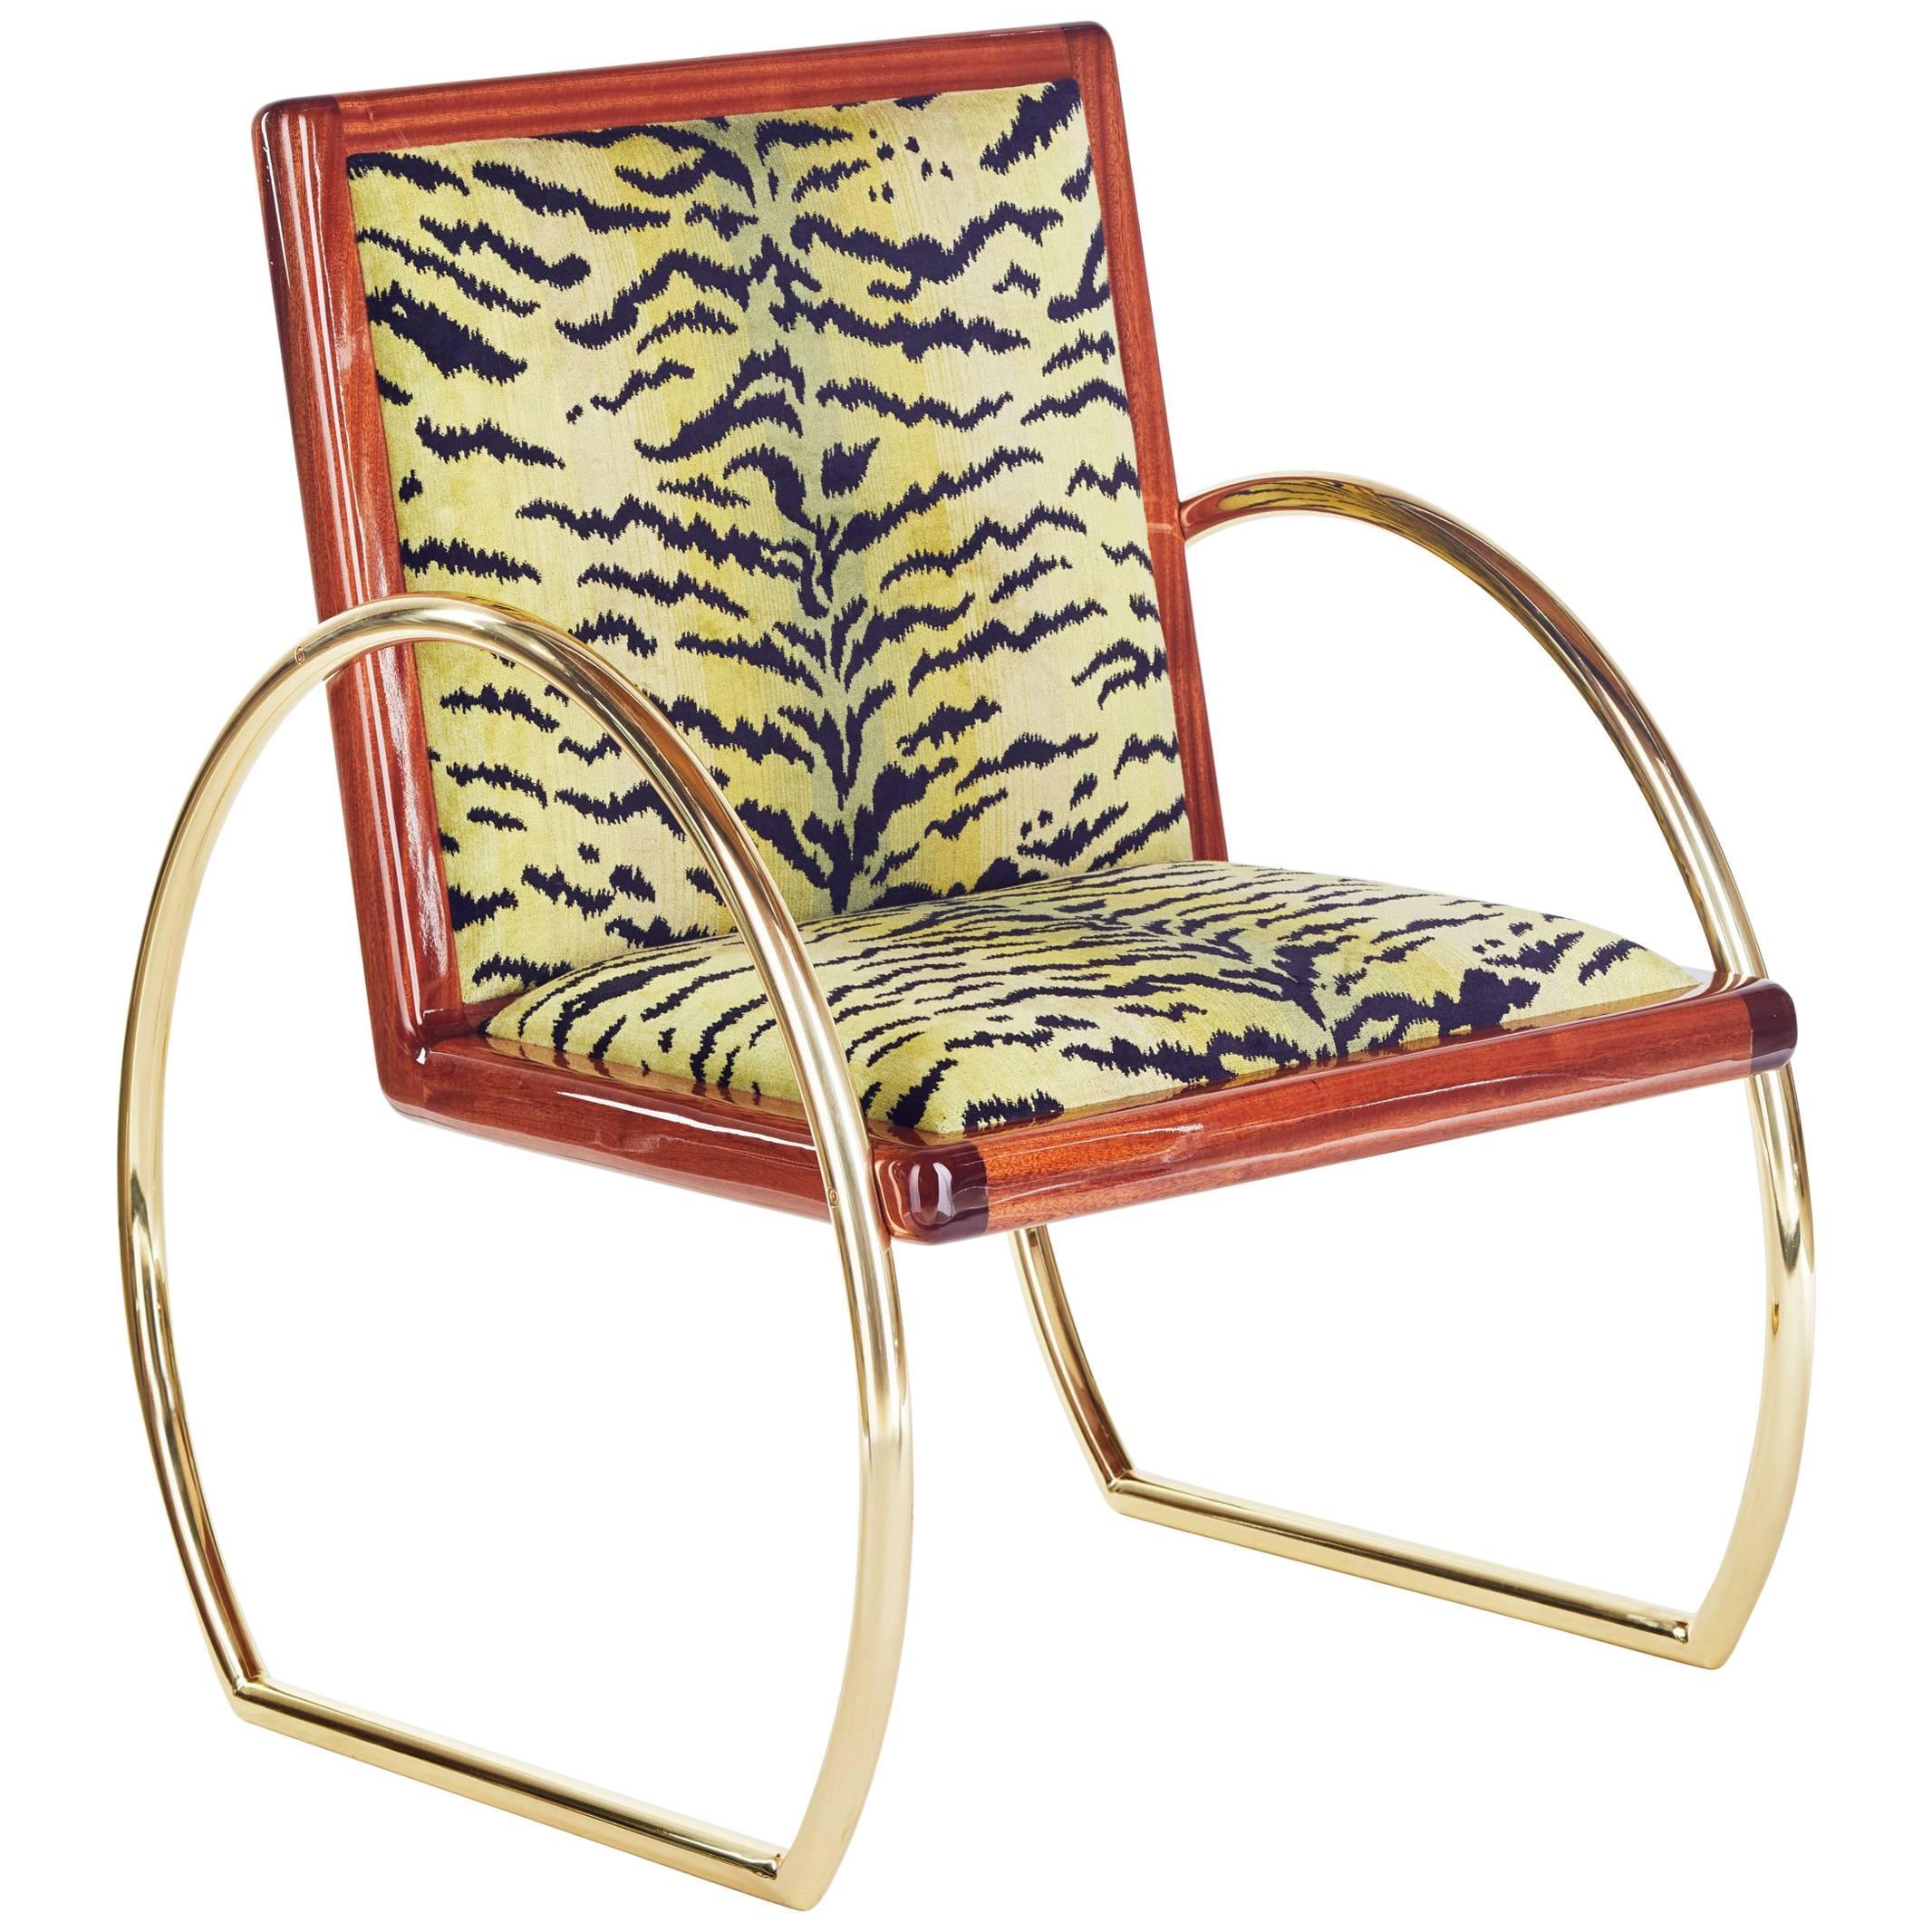 21st Century Handmade Contemporary Lounge Chair in Mahogany Brass